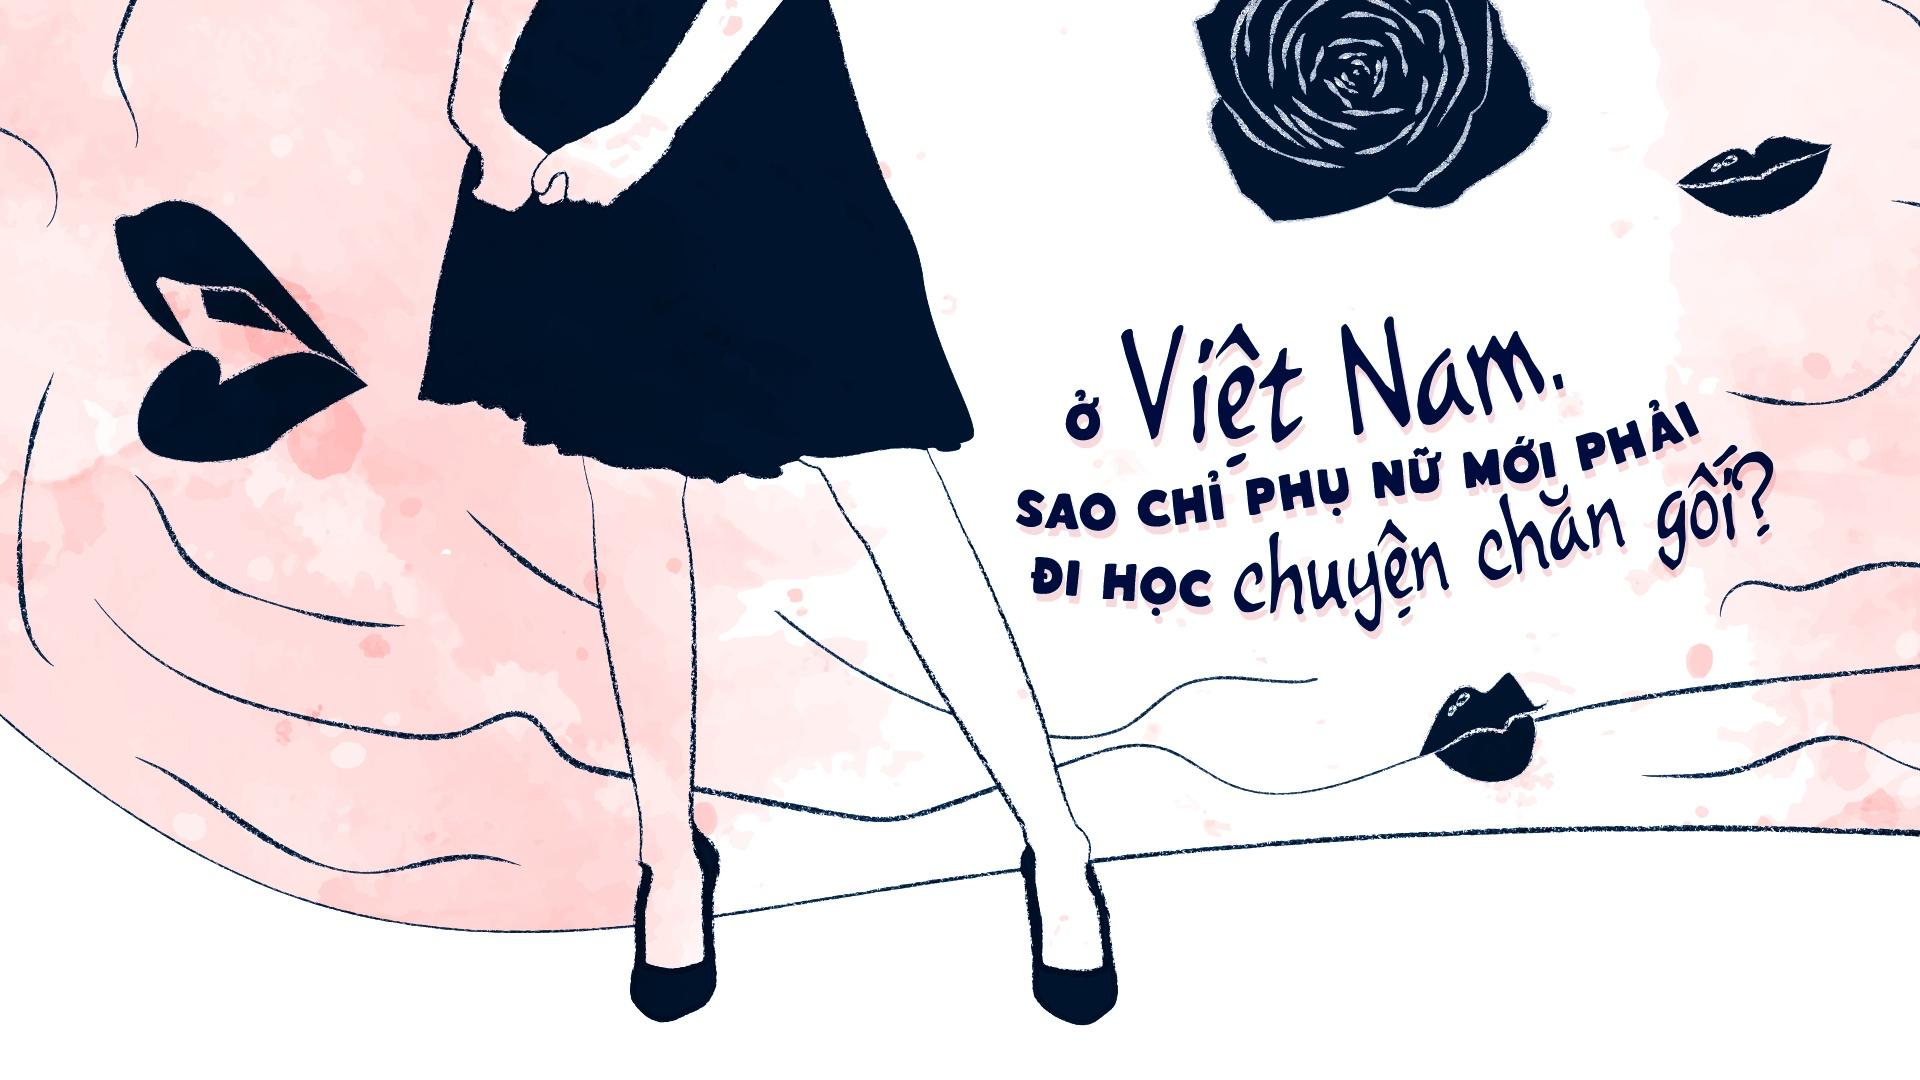 O Viet Nam, sao chi phu nu moi phai di hoc chuyen chan goi? hinh anh 2